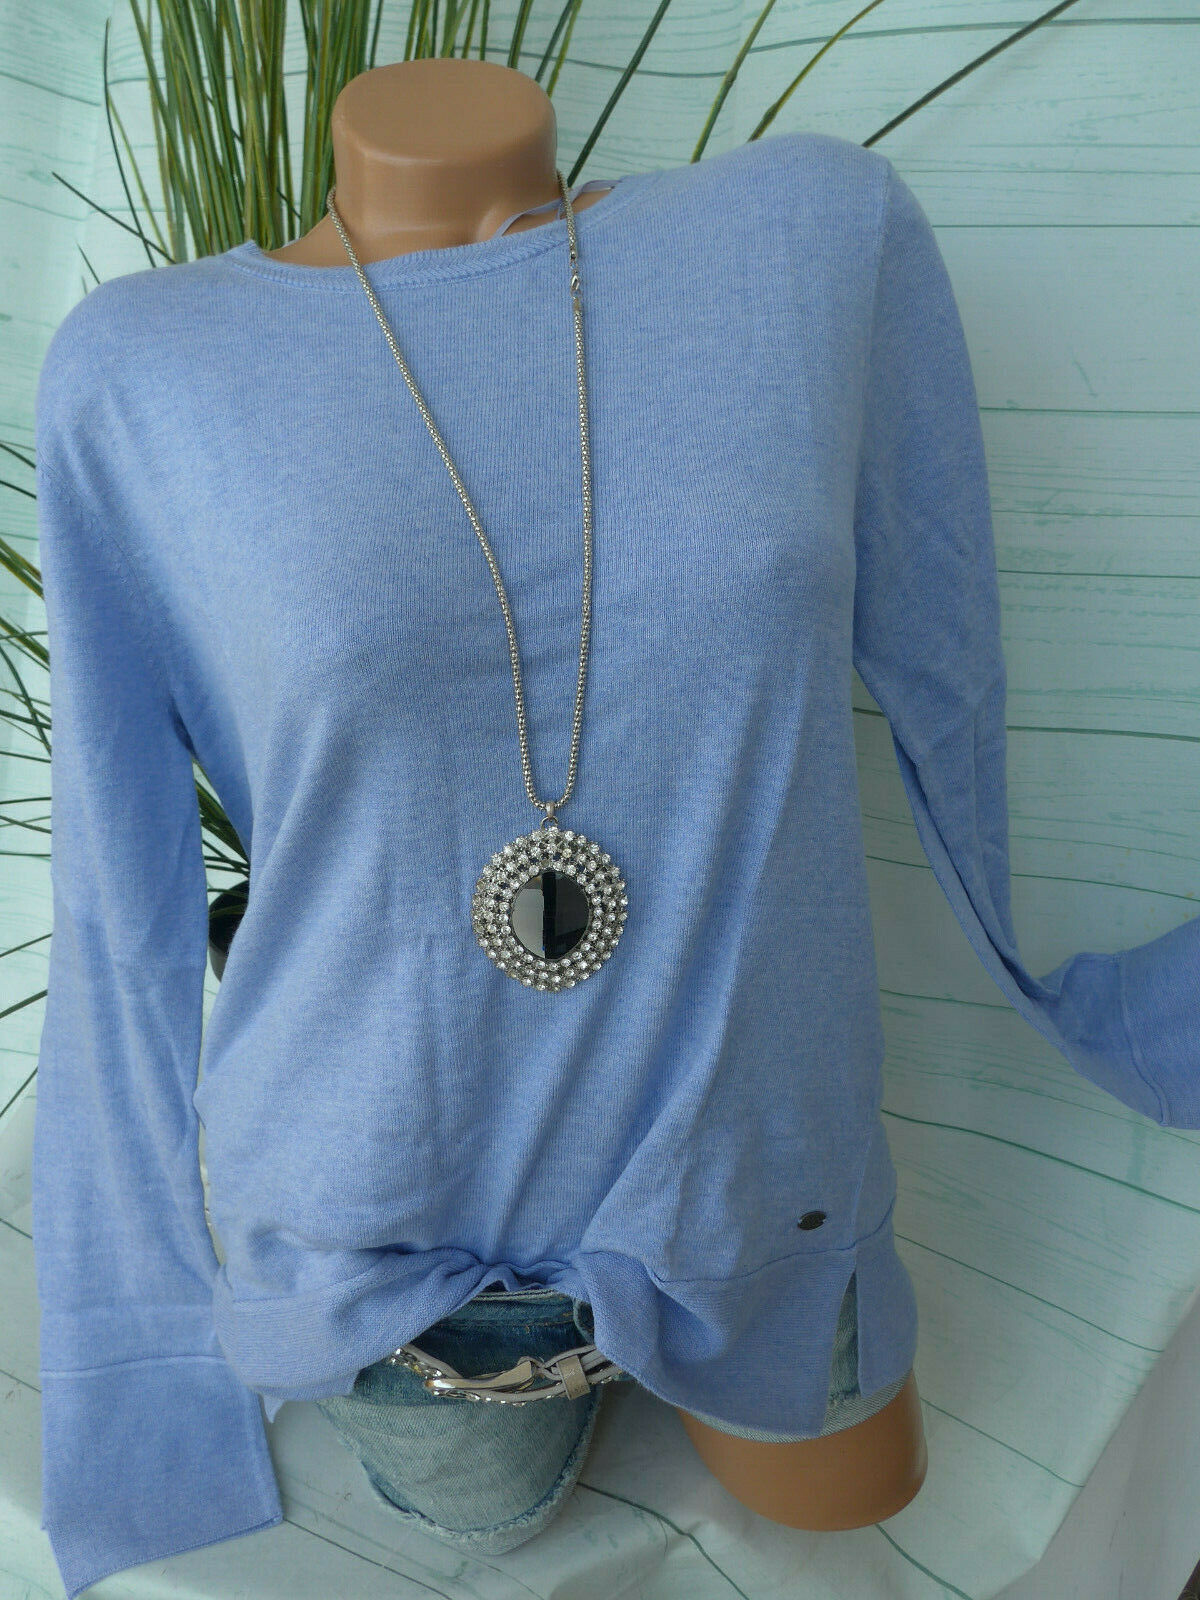 edc by Esprit Damen Pulli Pullover Gr. XL bis XXL blau Ton (149) NEU